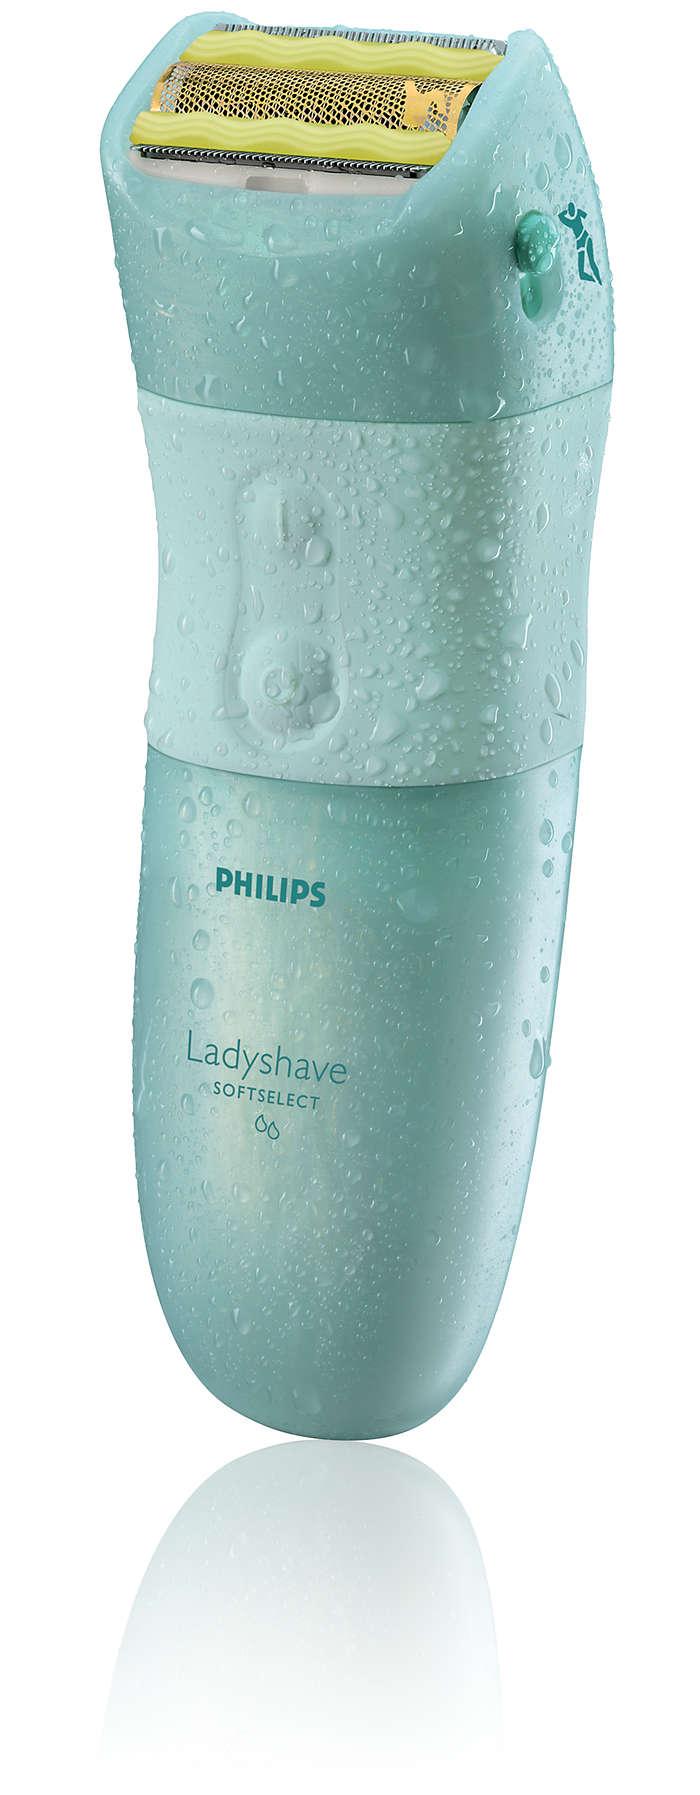 Ladyshave Soft Select 美容剃毛器